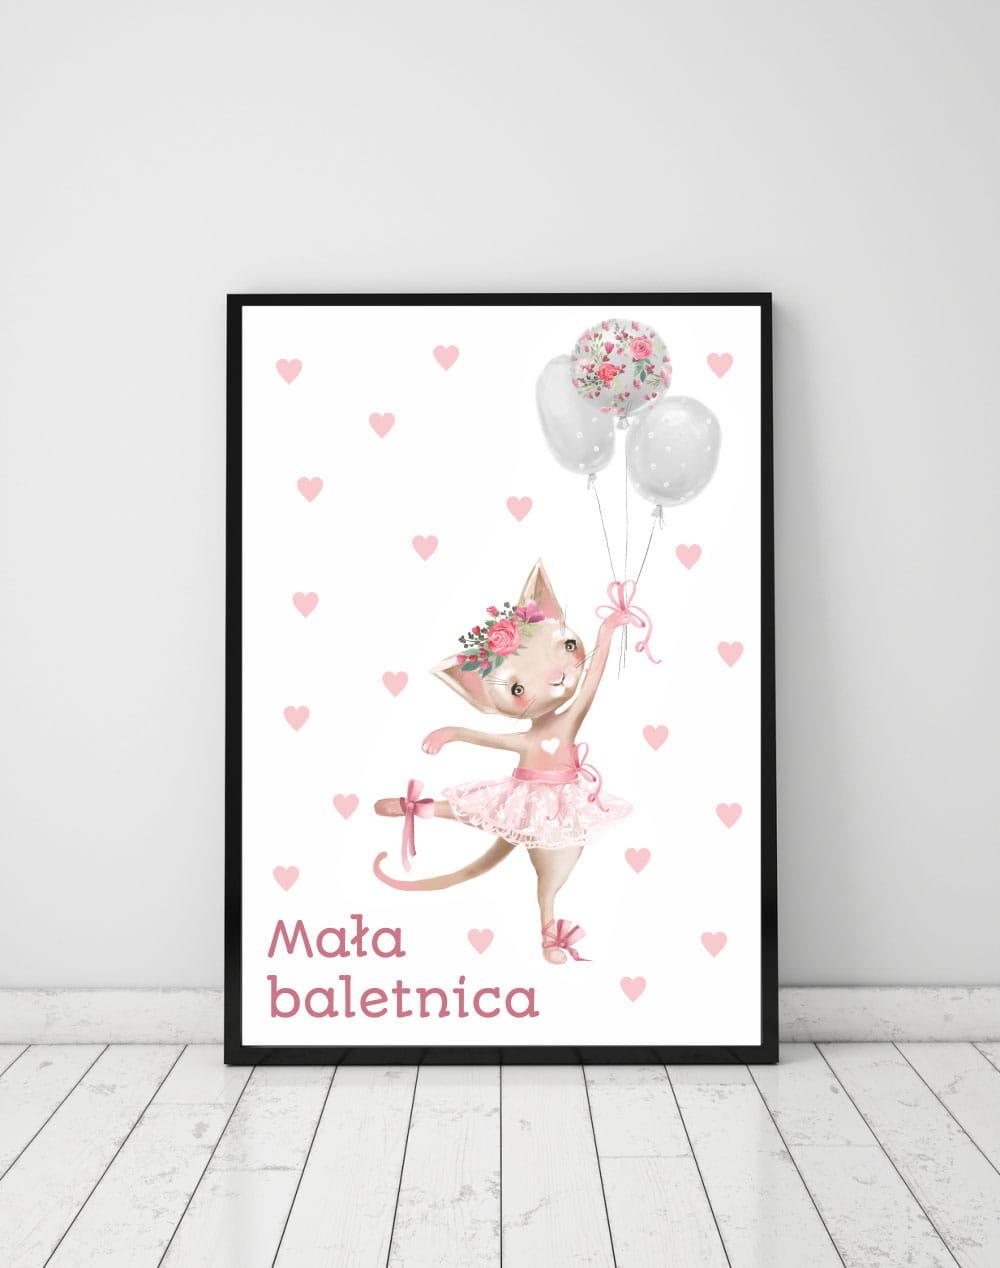 Plakat Na ścianę Baletnica Balonikikropki